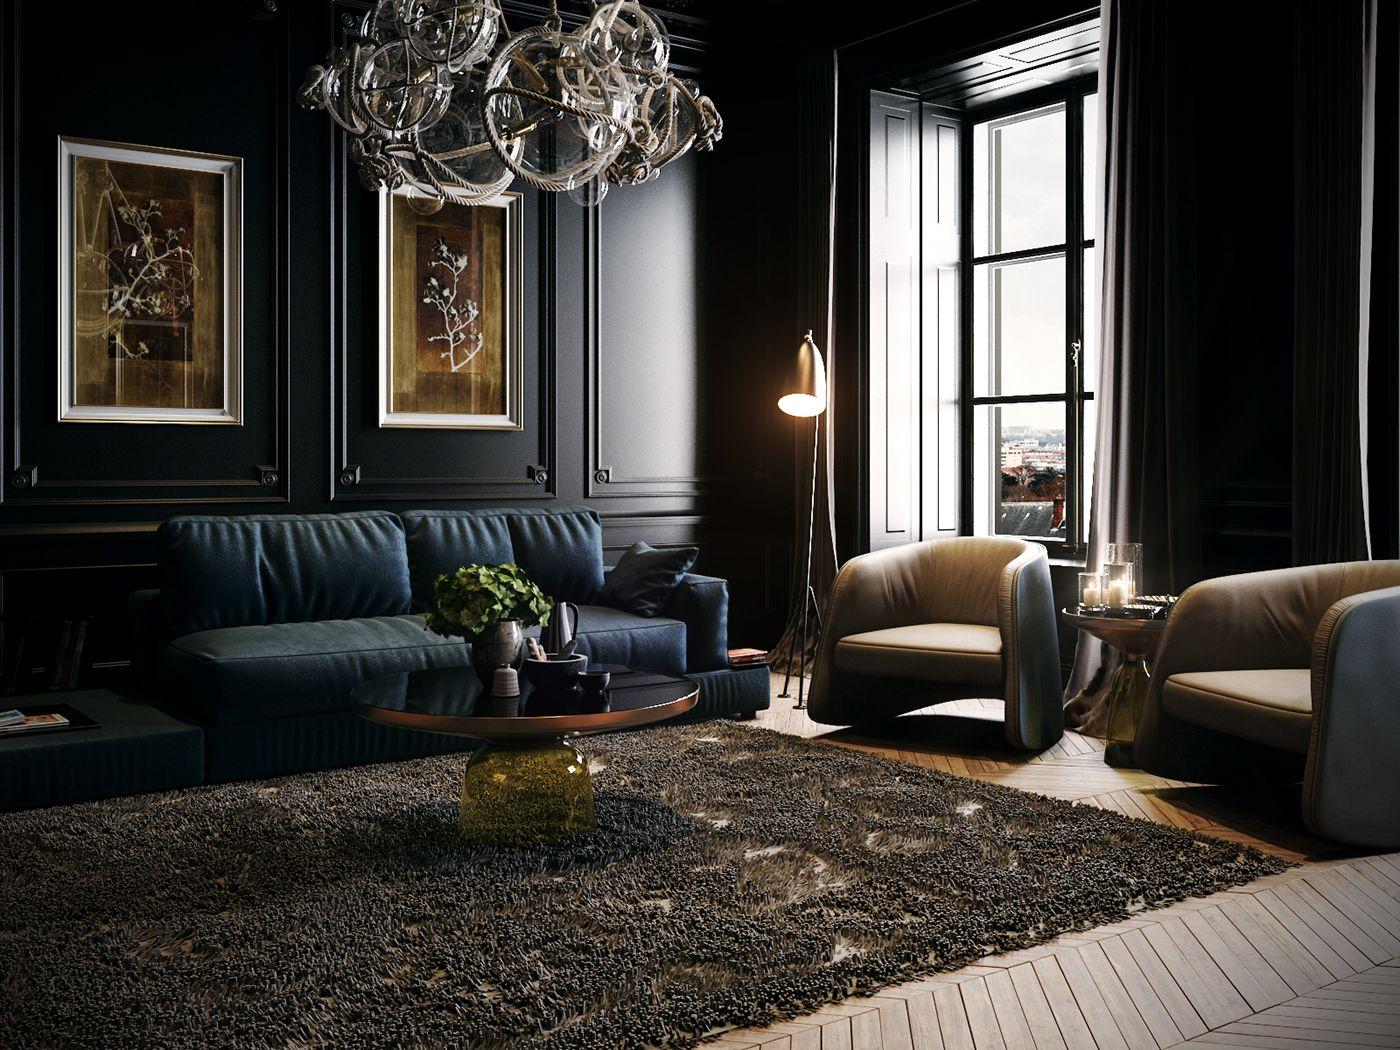 Black Classick Livingroom On Behance Dark Living Rooms Elegant Living Room Design Living Room Design Inspiration Dark decor living room